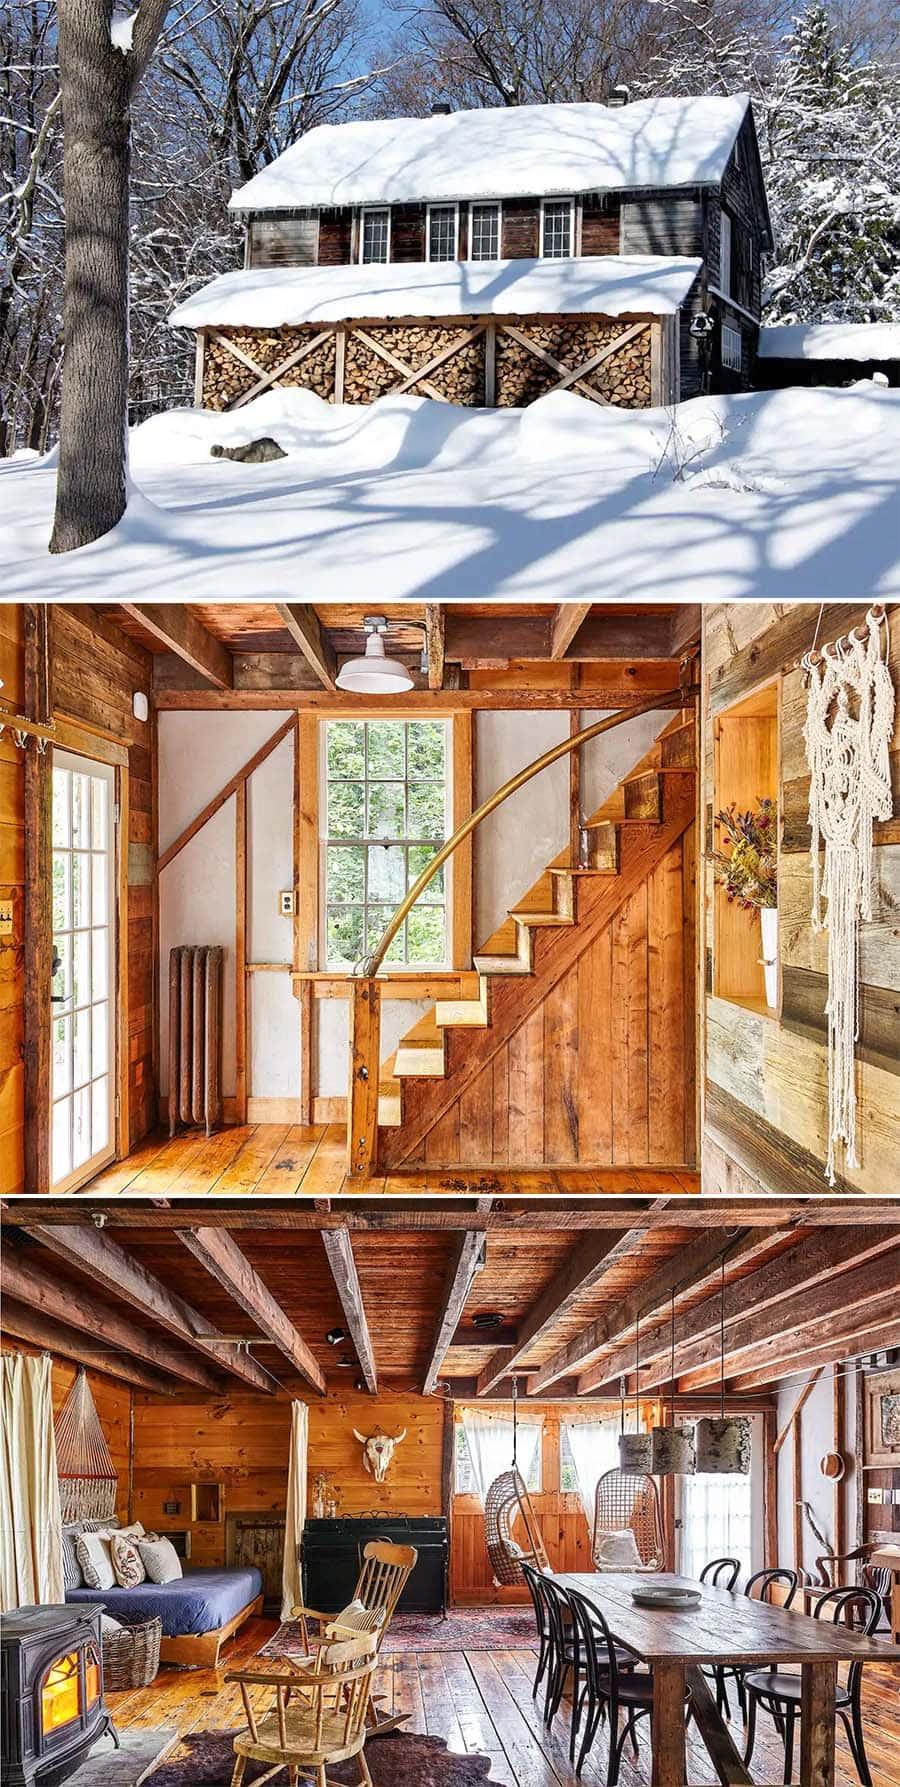 Hibernate barn in Tivoli, New York Airbnb cabin